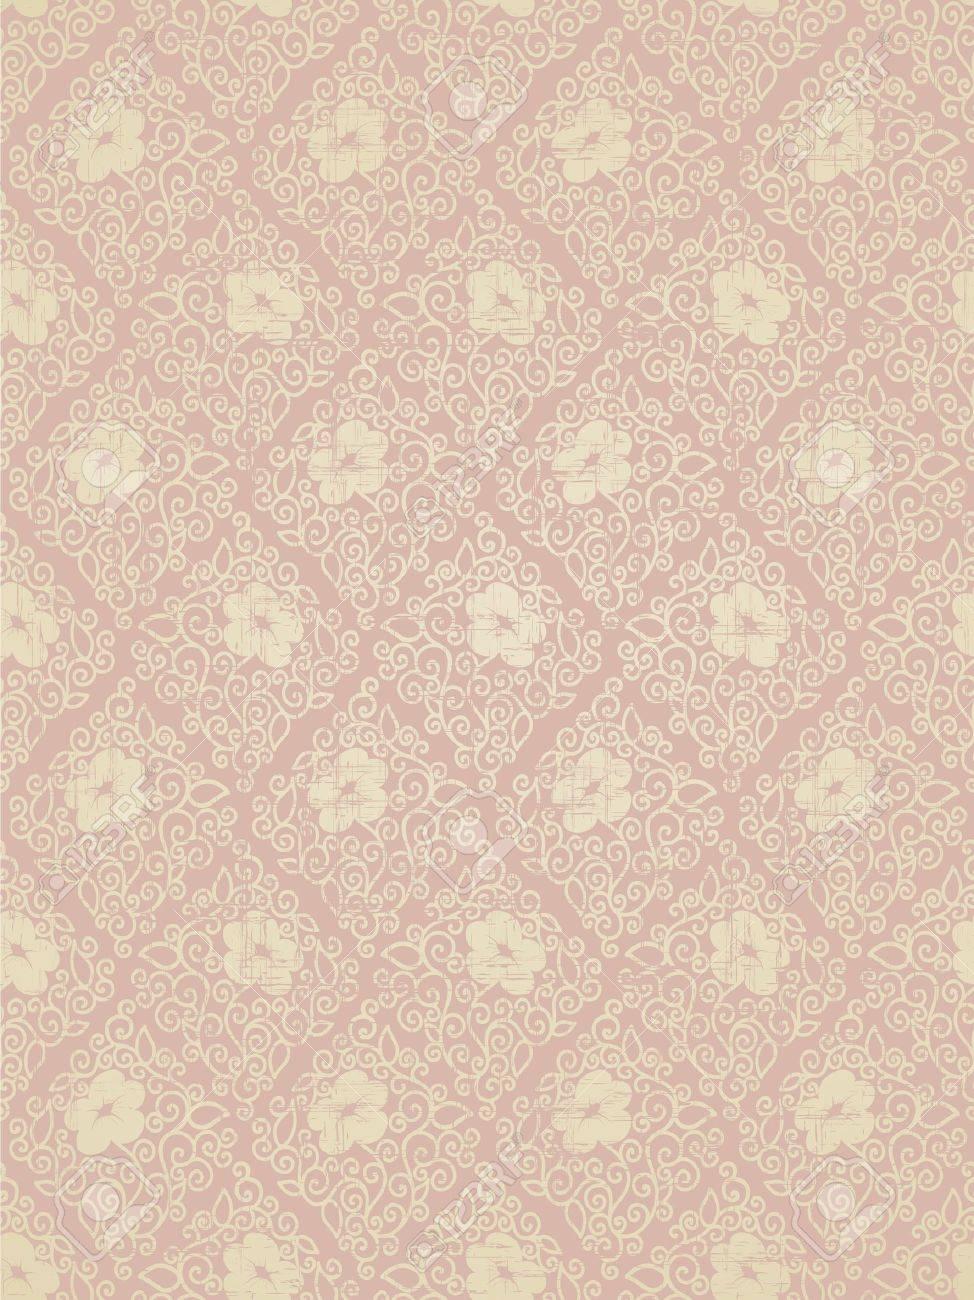 Seamless floral vintage ornament - 10968875